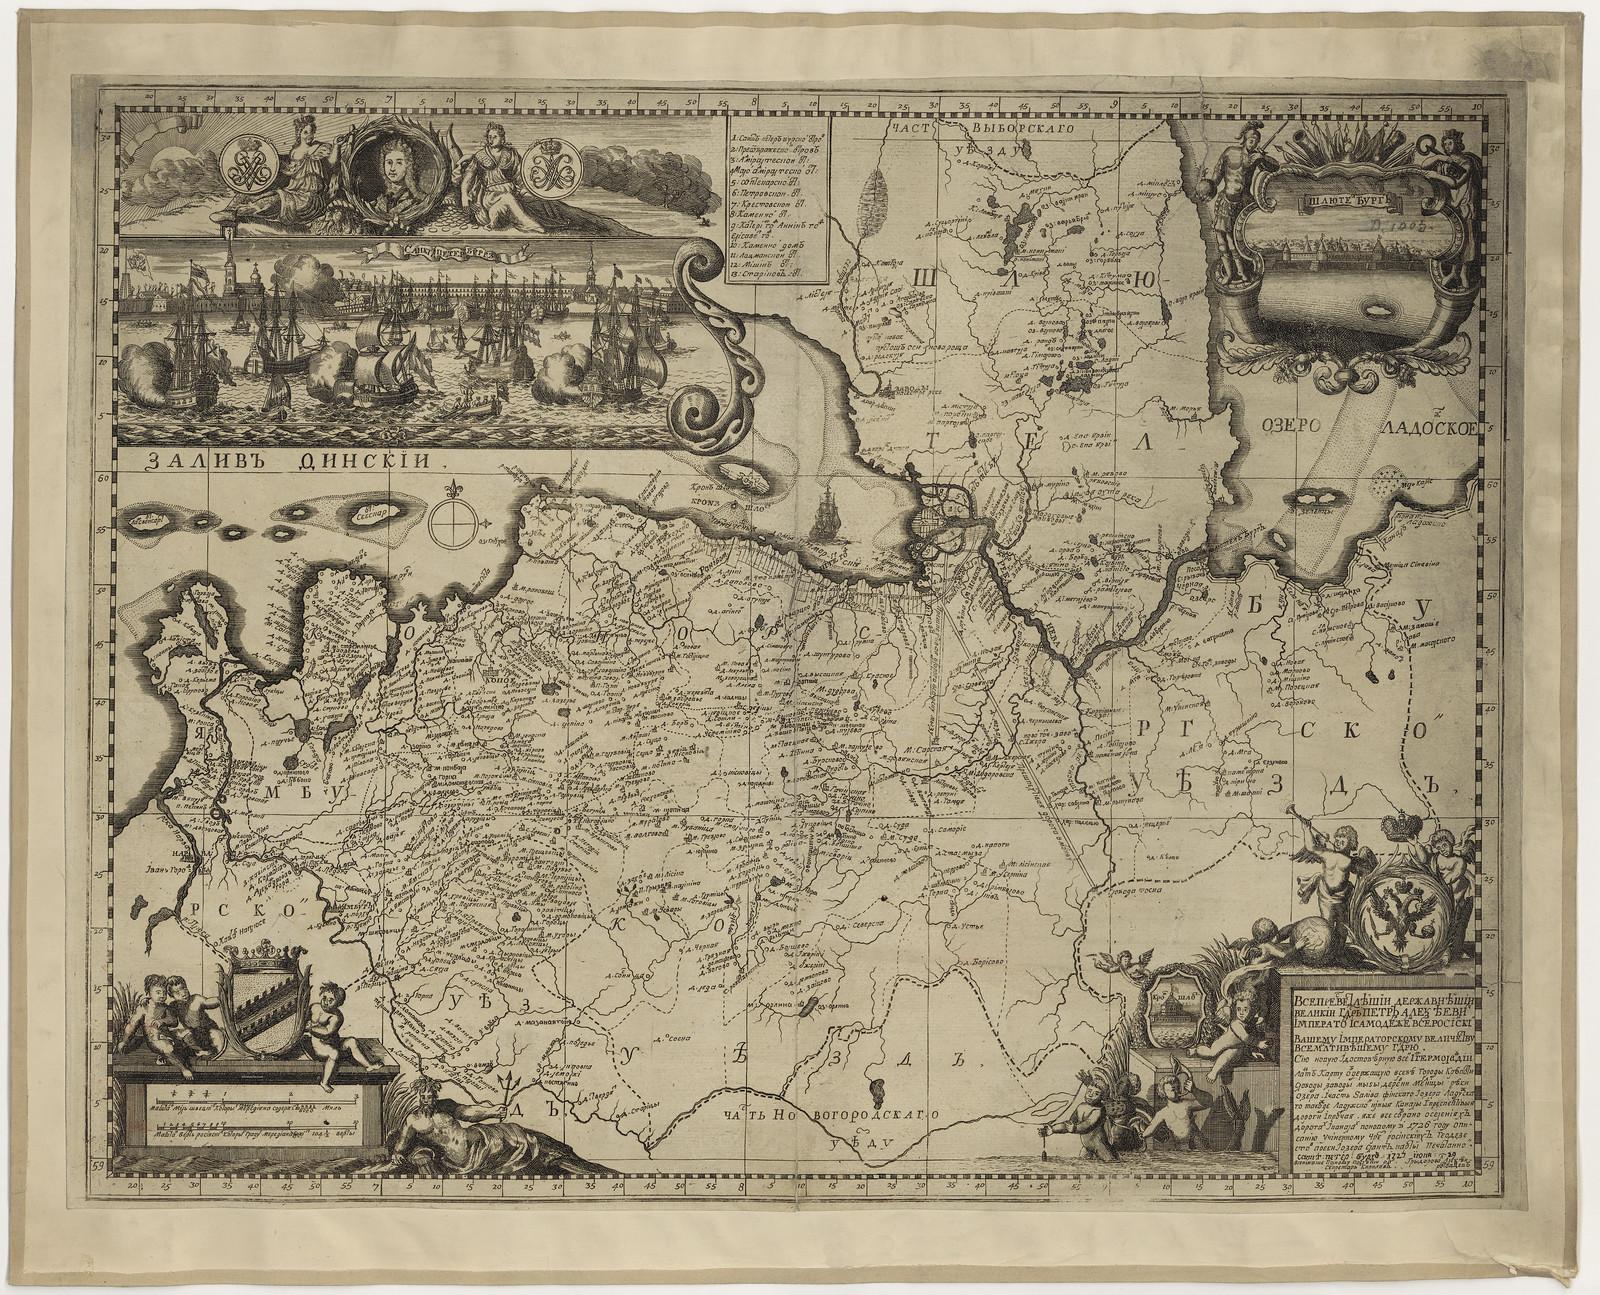 1727. Карта Ингерманландии Кириллова